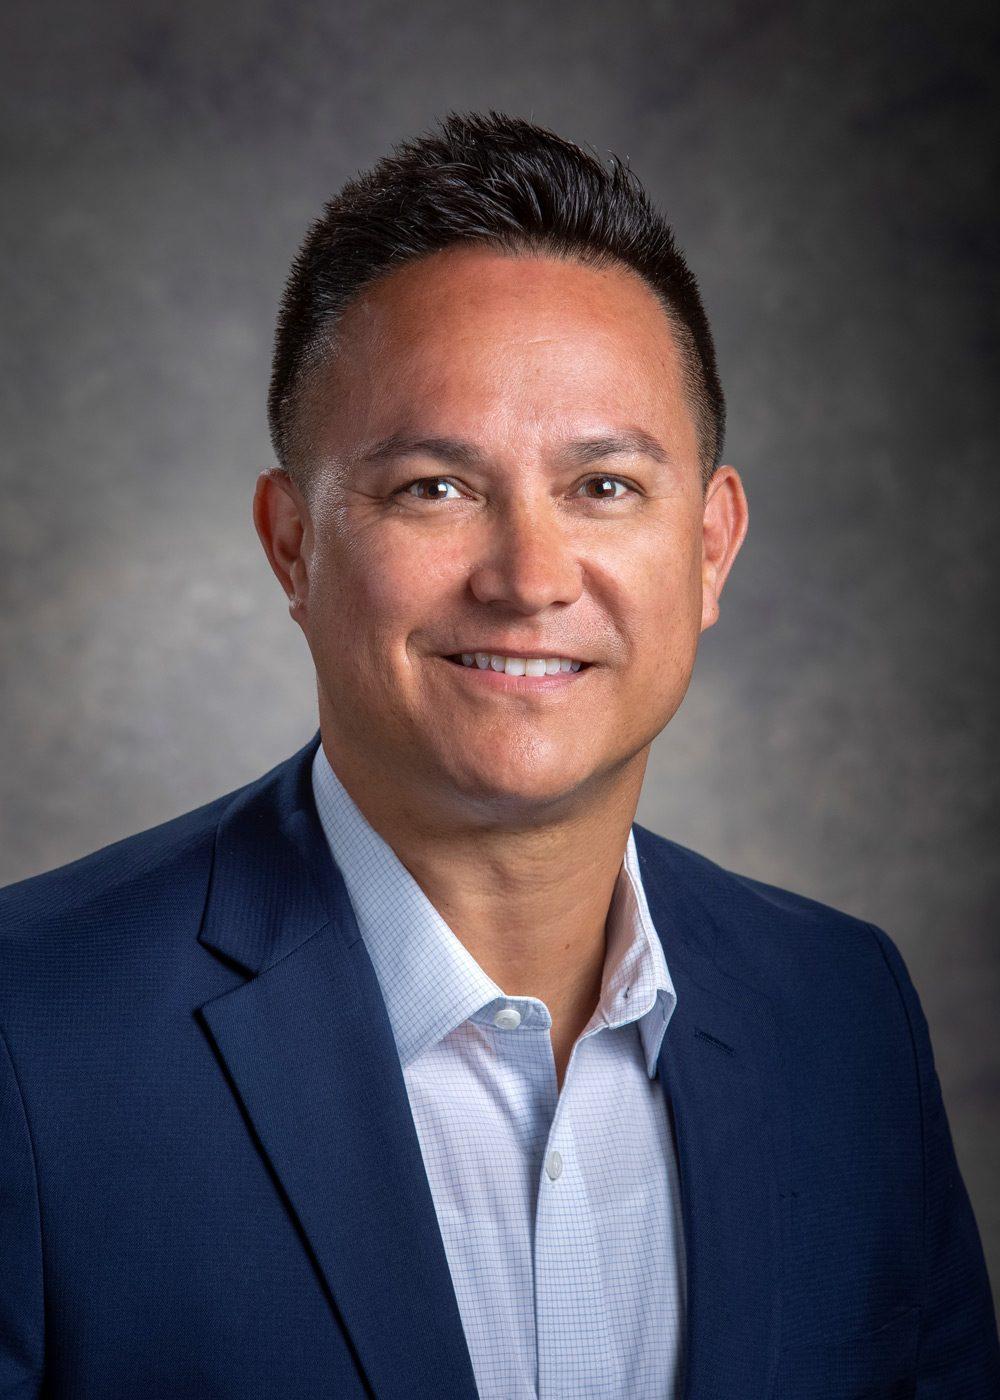 Christopher Matsuoka